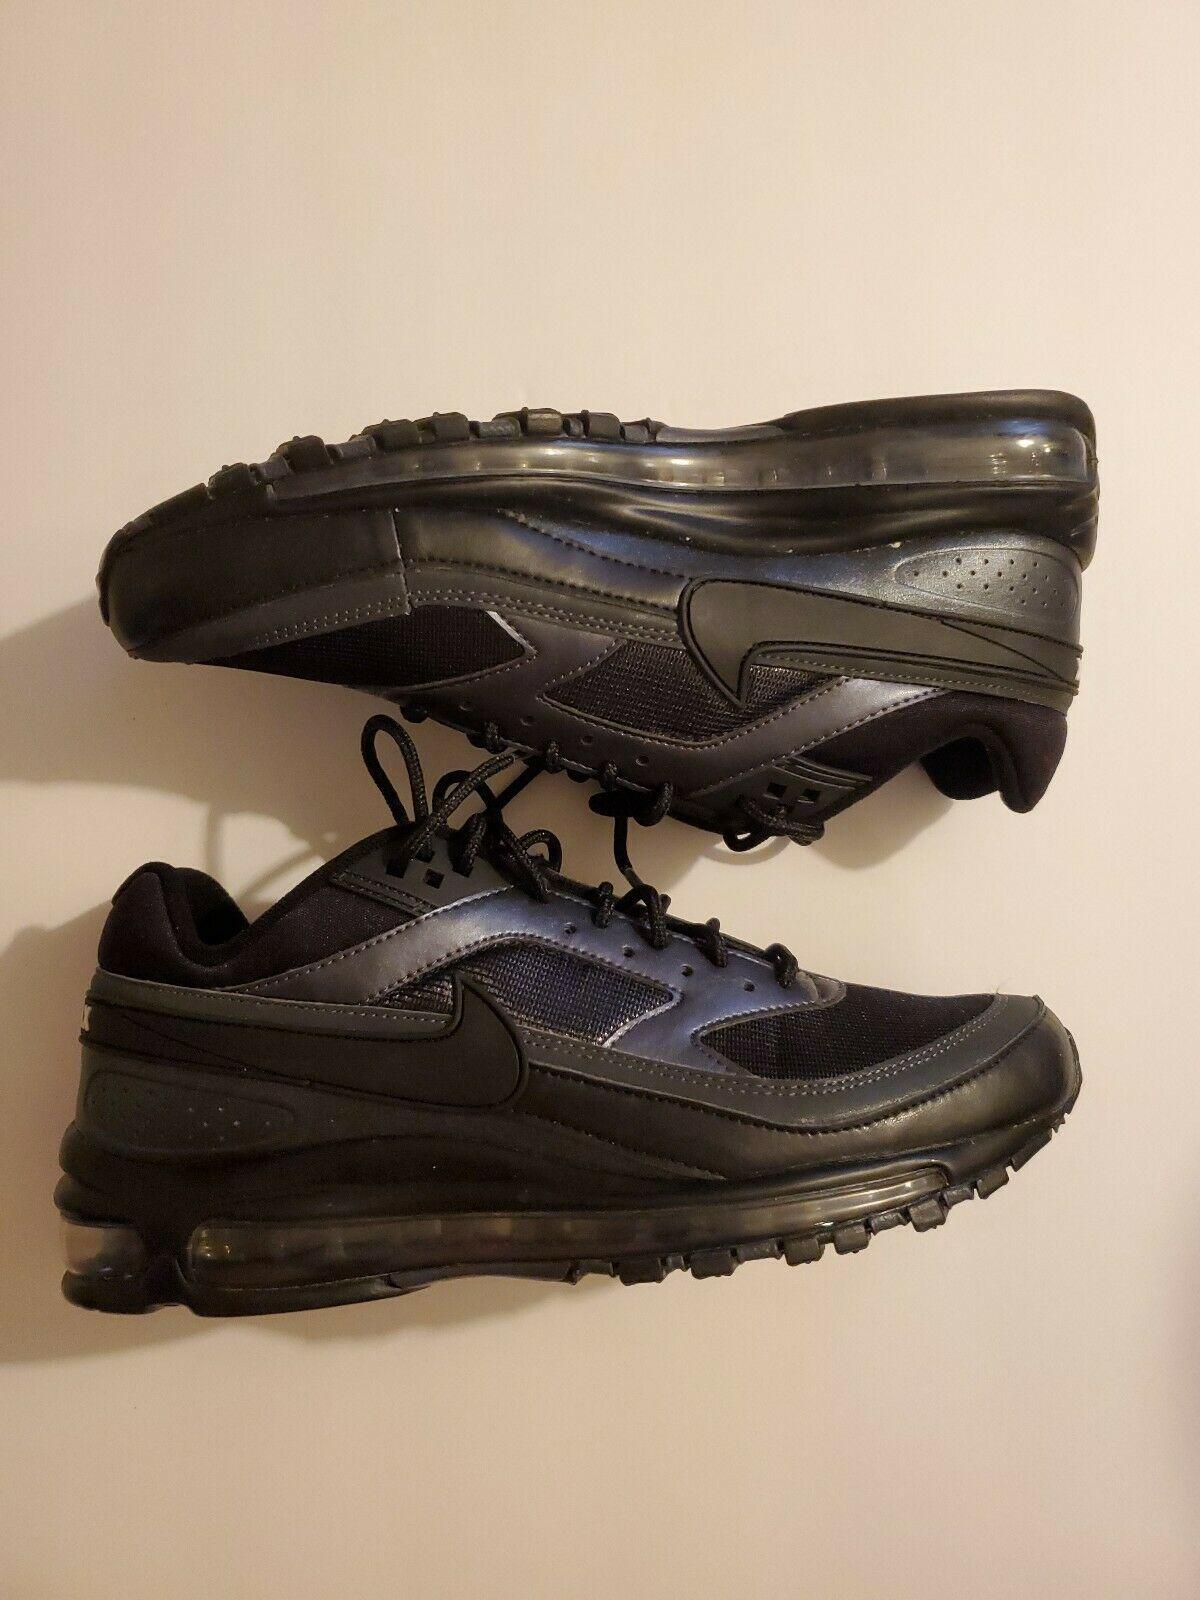 Nike Air Max 97/BW Running Shoes Black Metallic Hematite Men's Sz 7 AO2406-001